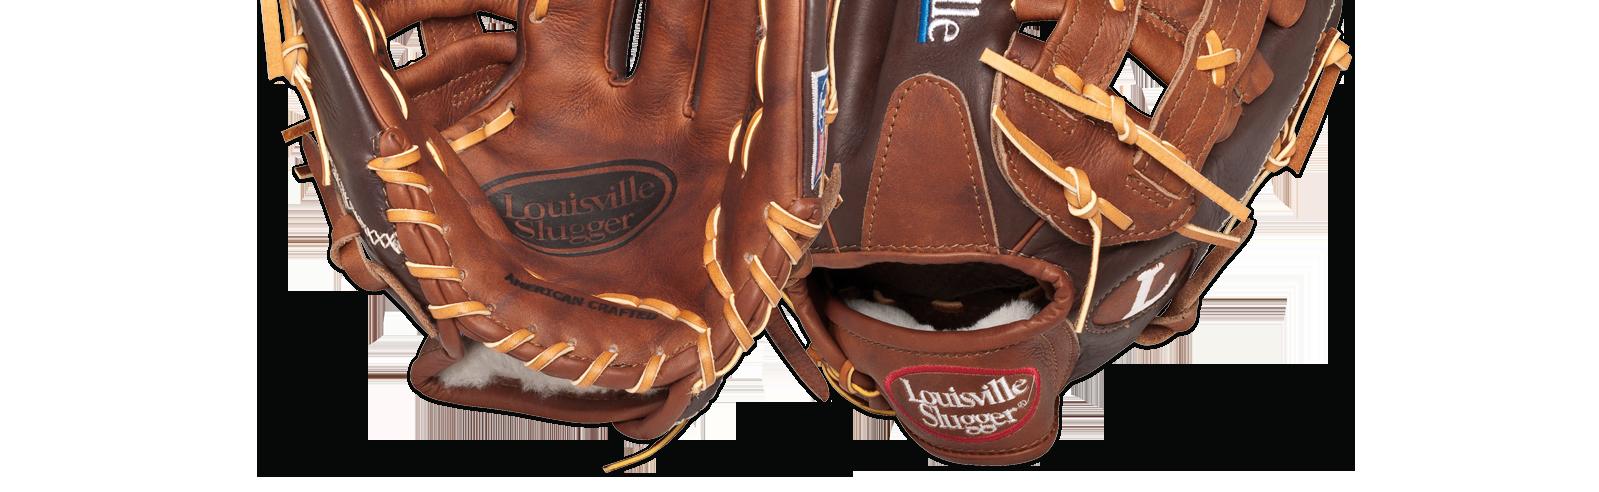 IC1175-field-glove-03